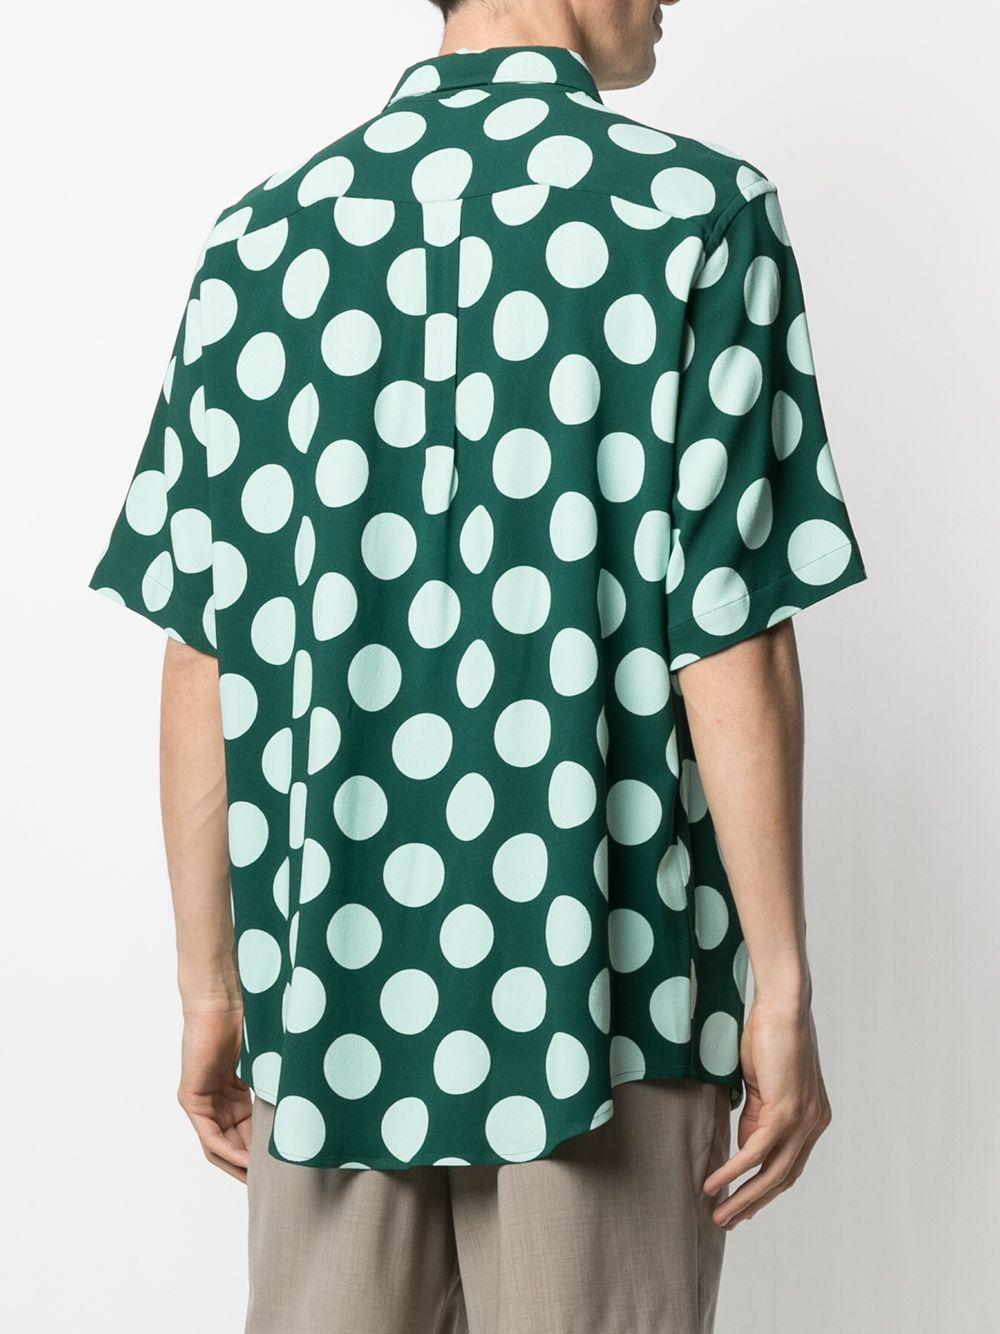 POLKA DOT SHIRT AMI - ALEXANDRE MATTIUSSI | Shirts | E21HC259.294310